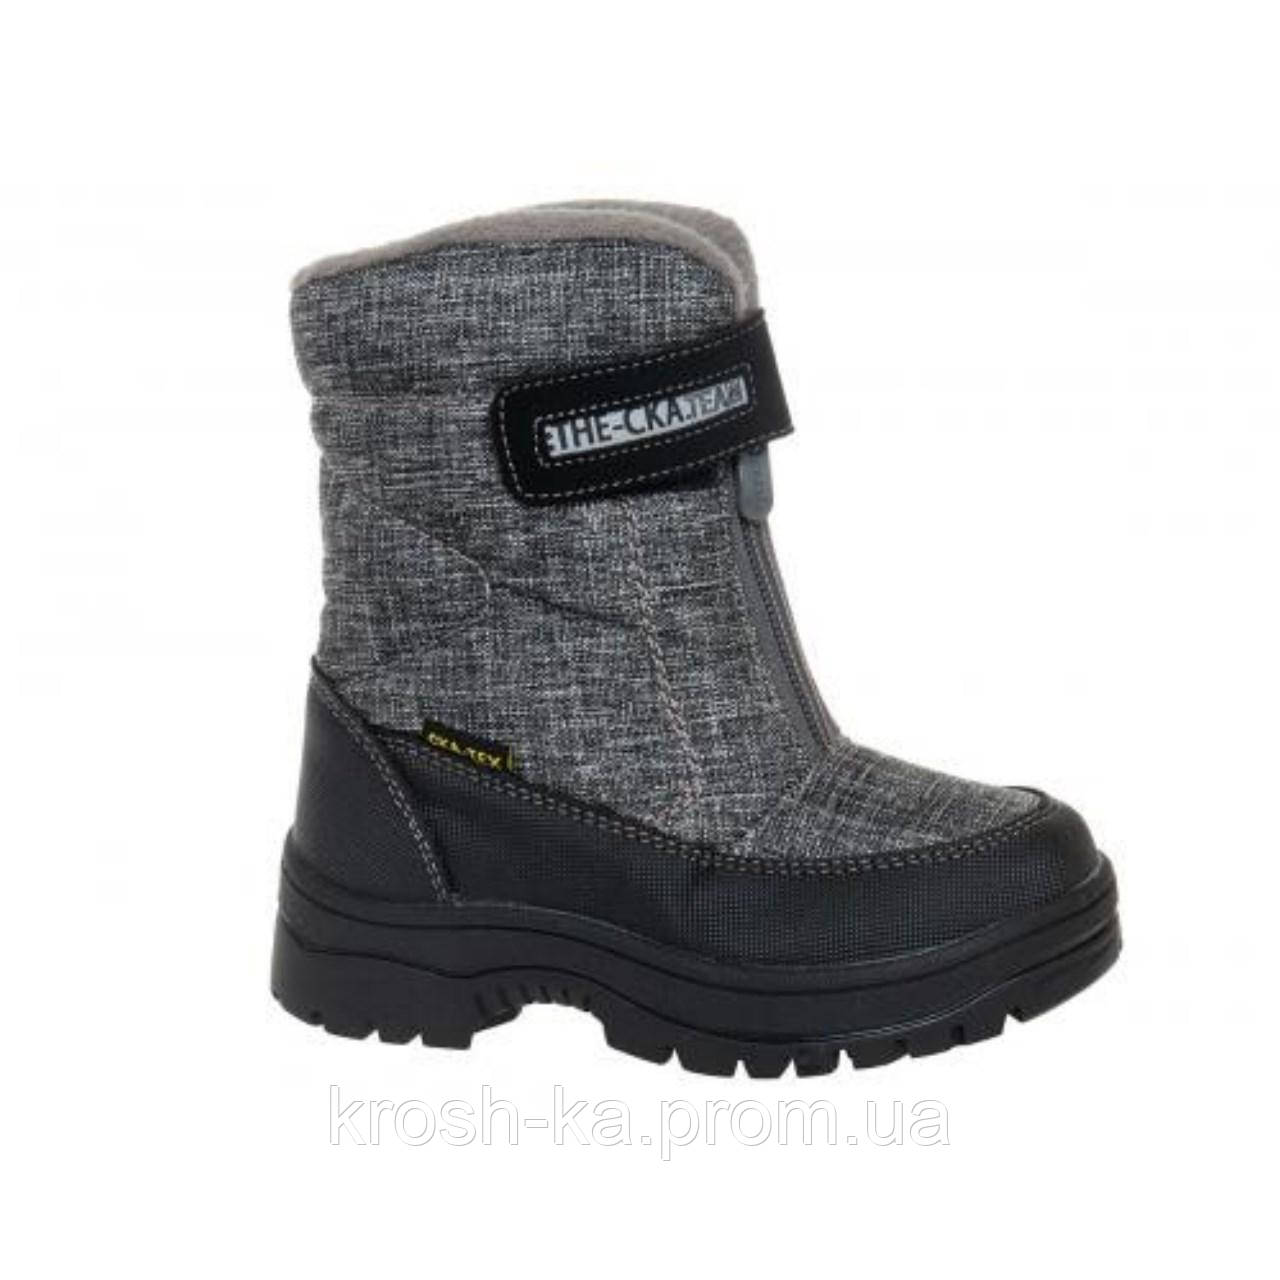 Ботинки для мальчика термо на очине(27-32)р Weestep Китай серый R918137742GR